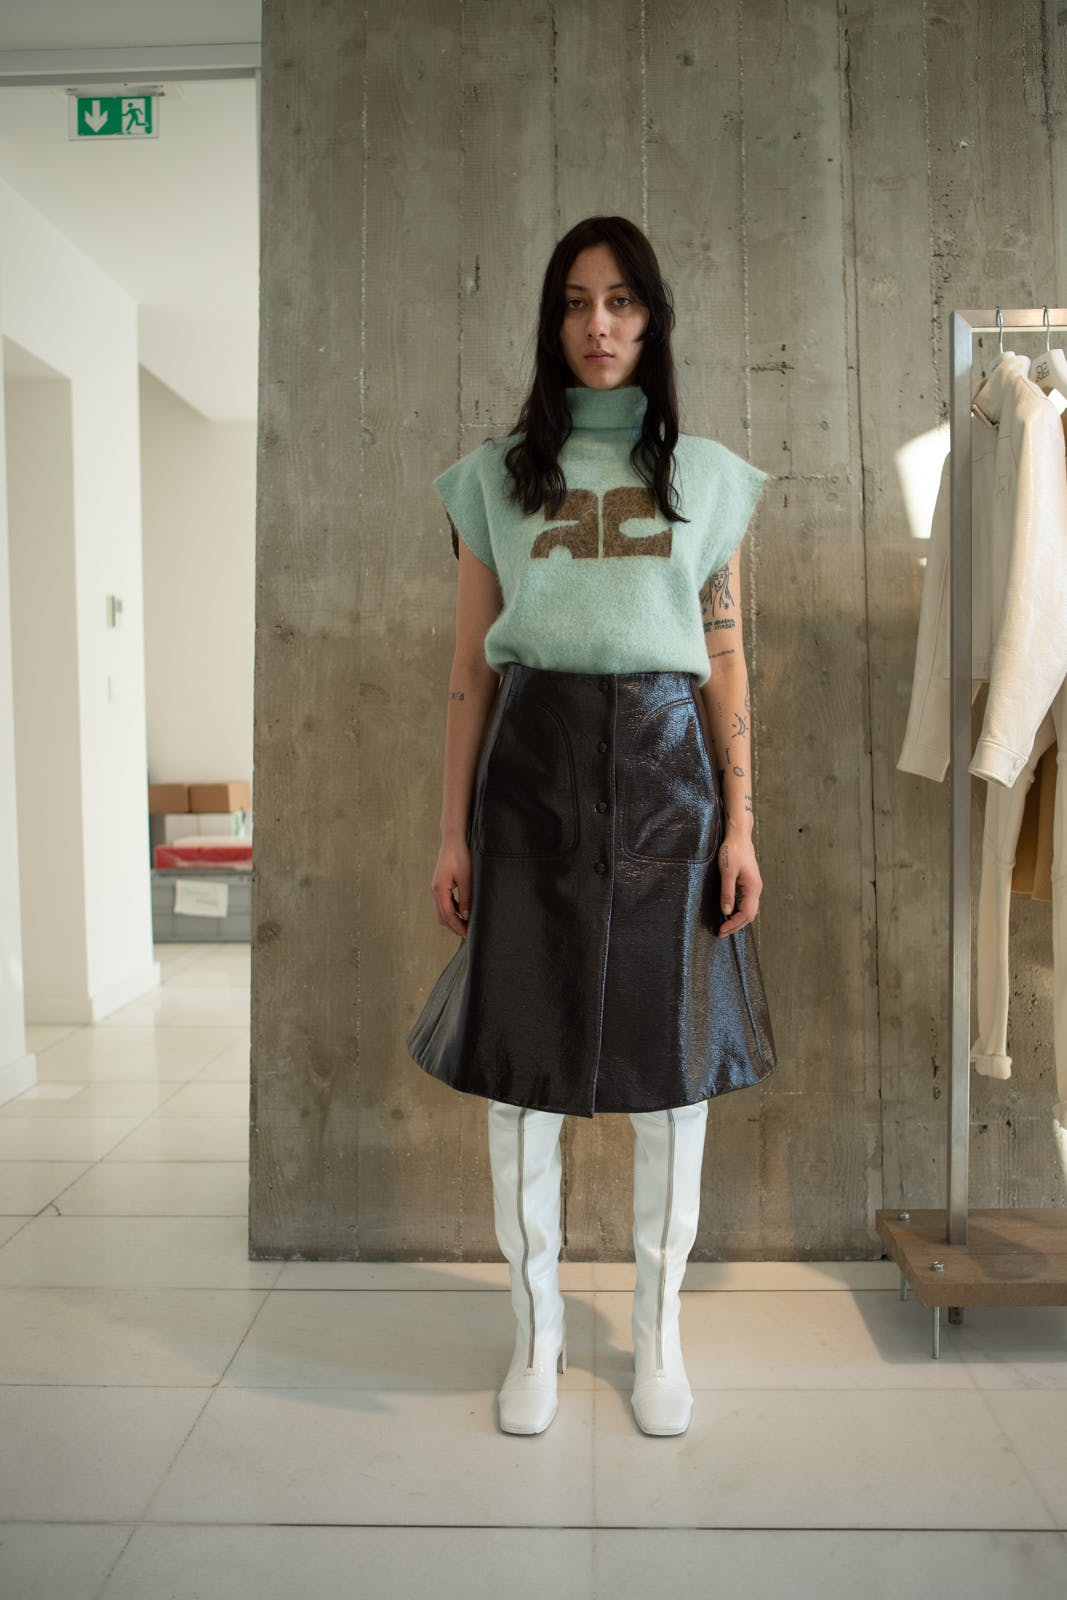 courreges fall winter 2020 runway fashion show backstage womenswear showroom pre order trunk show paris